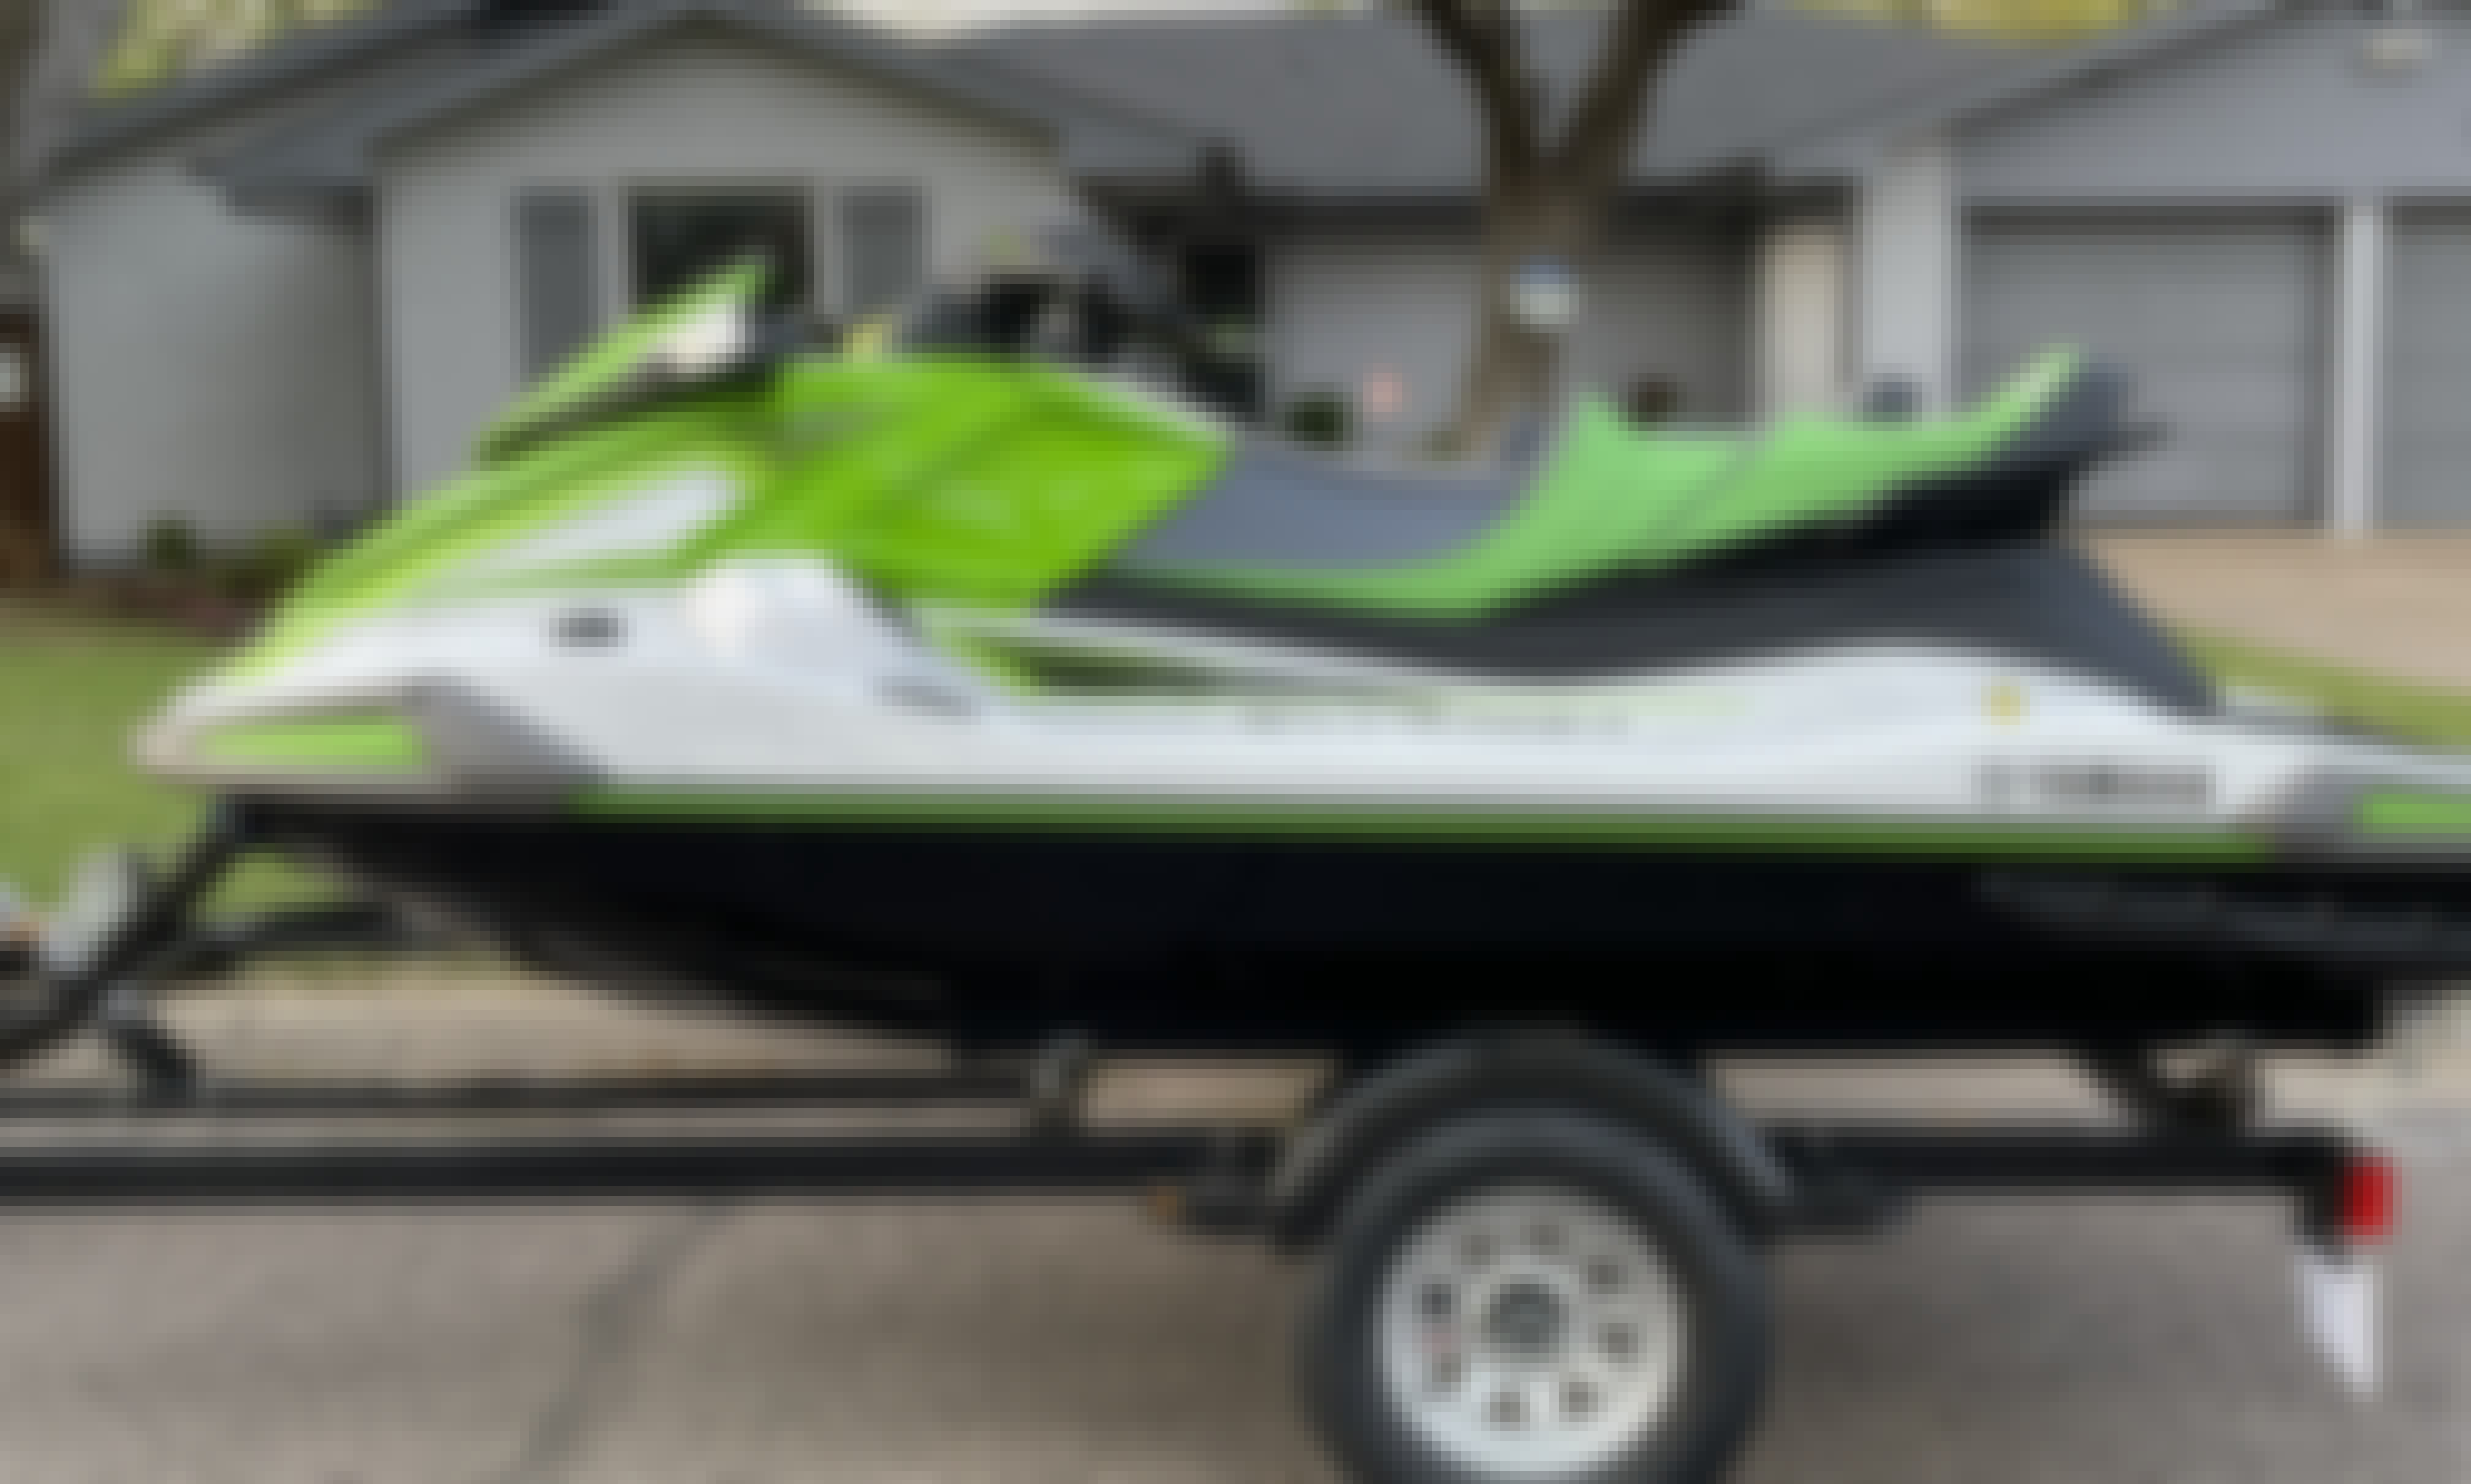 2021 Yamaha Waverunner Jet Skis For Rent x 2 | Possum Kingdom Lake